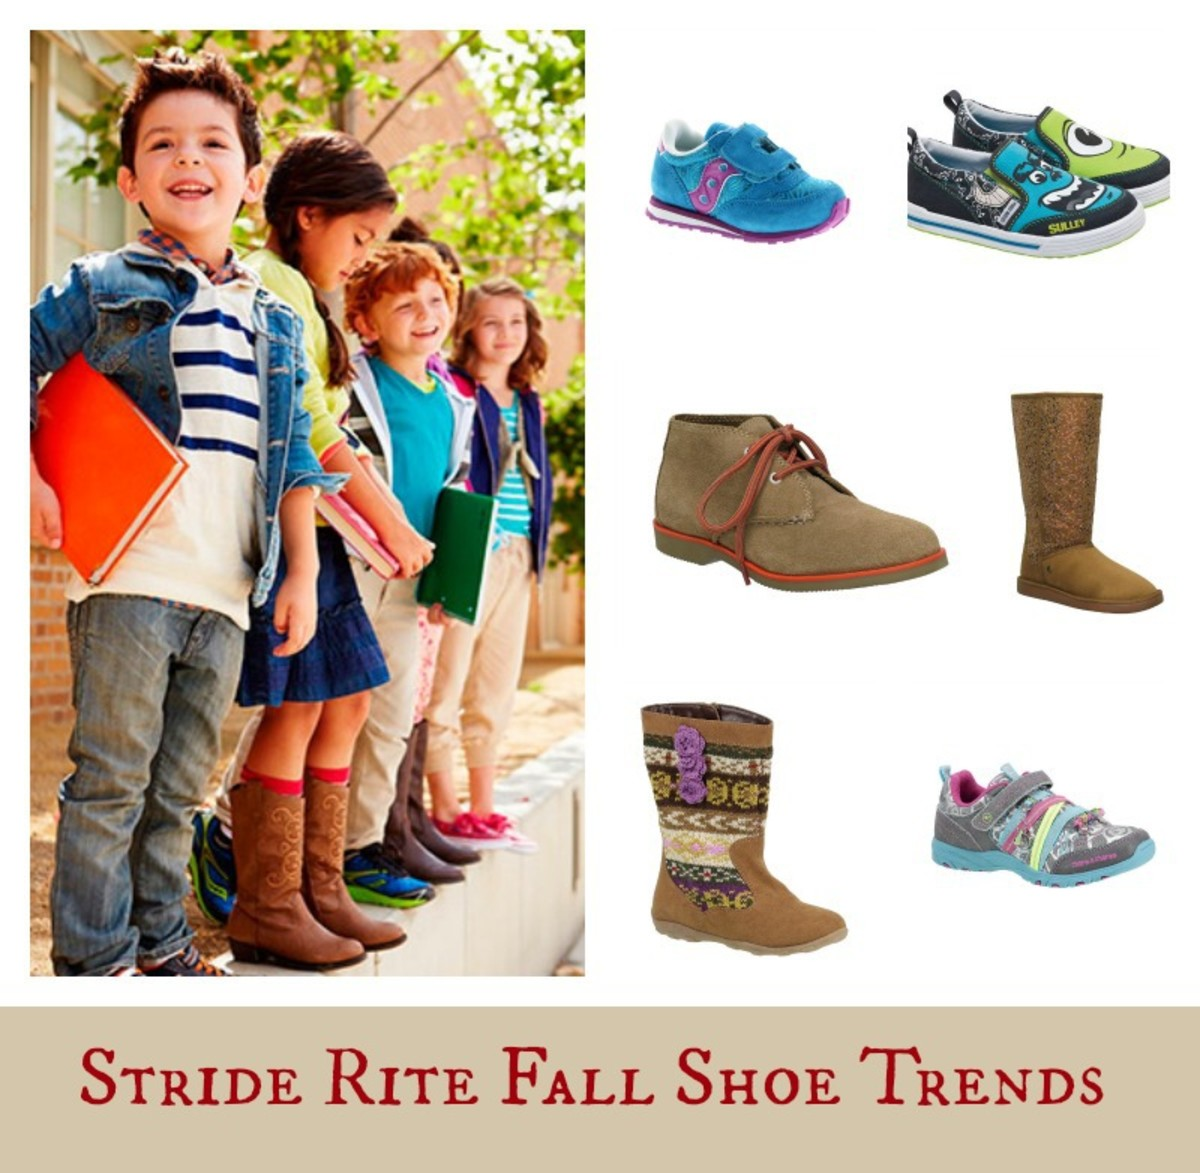 Stride Rite, Stride Rite shoe trends, shoe trends